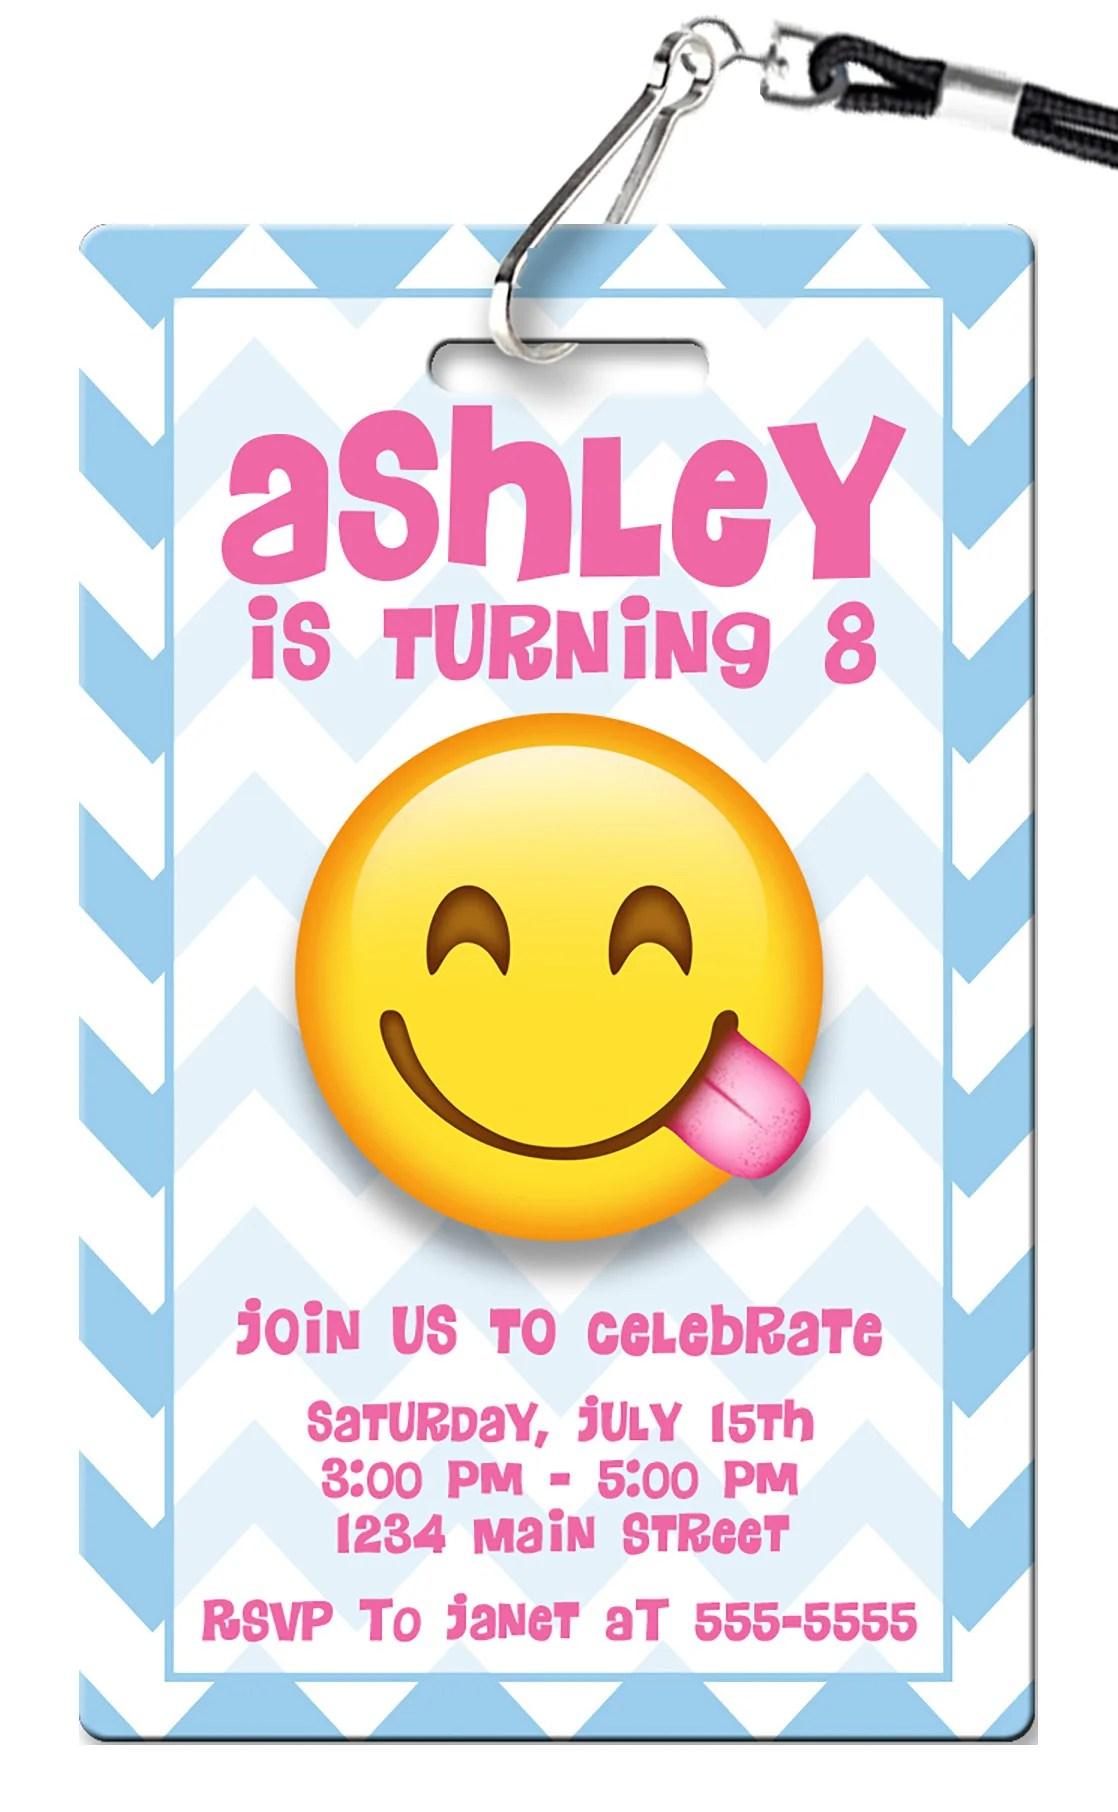 Gracious Emoji Birthday Invitation Emoji Birthday Invitations Pvc Invites Vip Birthday Invitations Emoji Birthday Invitations Online Emoji Birthday Invitations To Print invitations Emoji Birthday Invitations